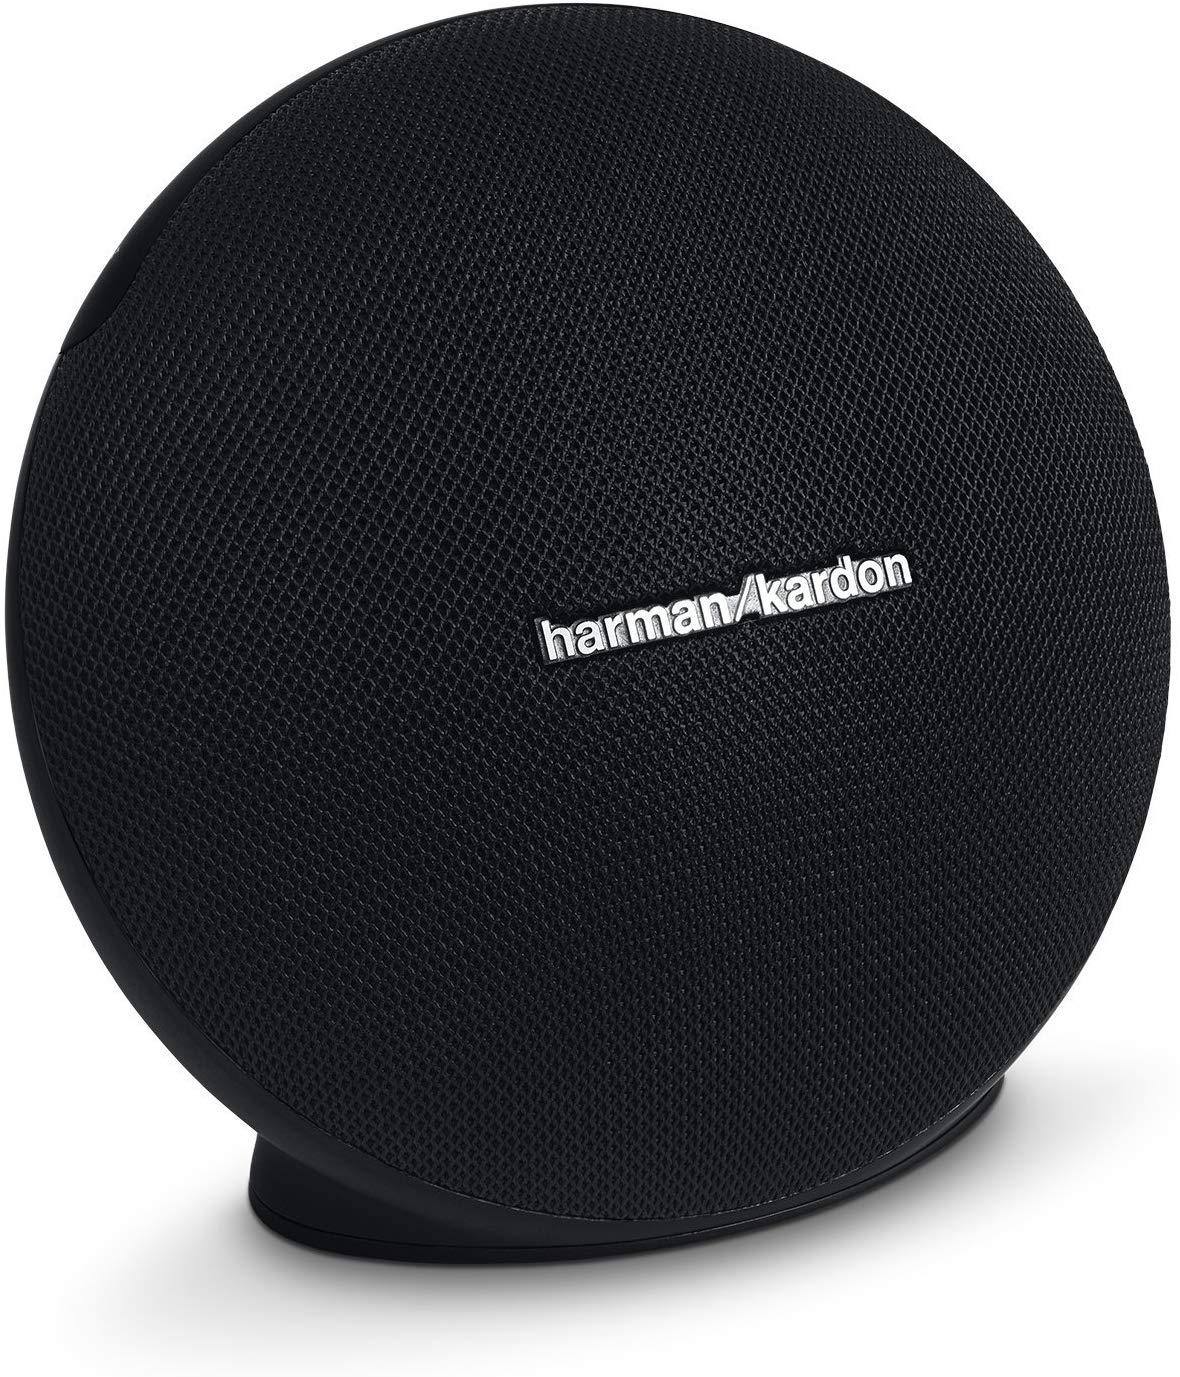 (Usado - Como nuevo) Desde UK - Harman-Kardon ONYX MINI Bluetooth Active